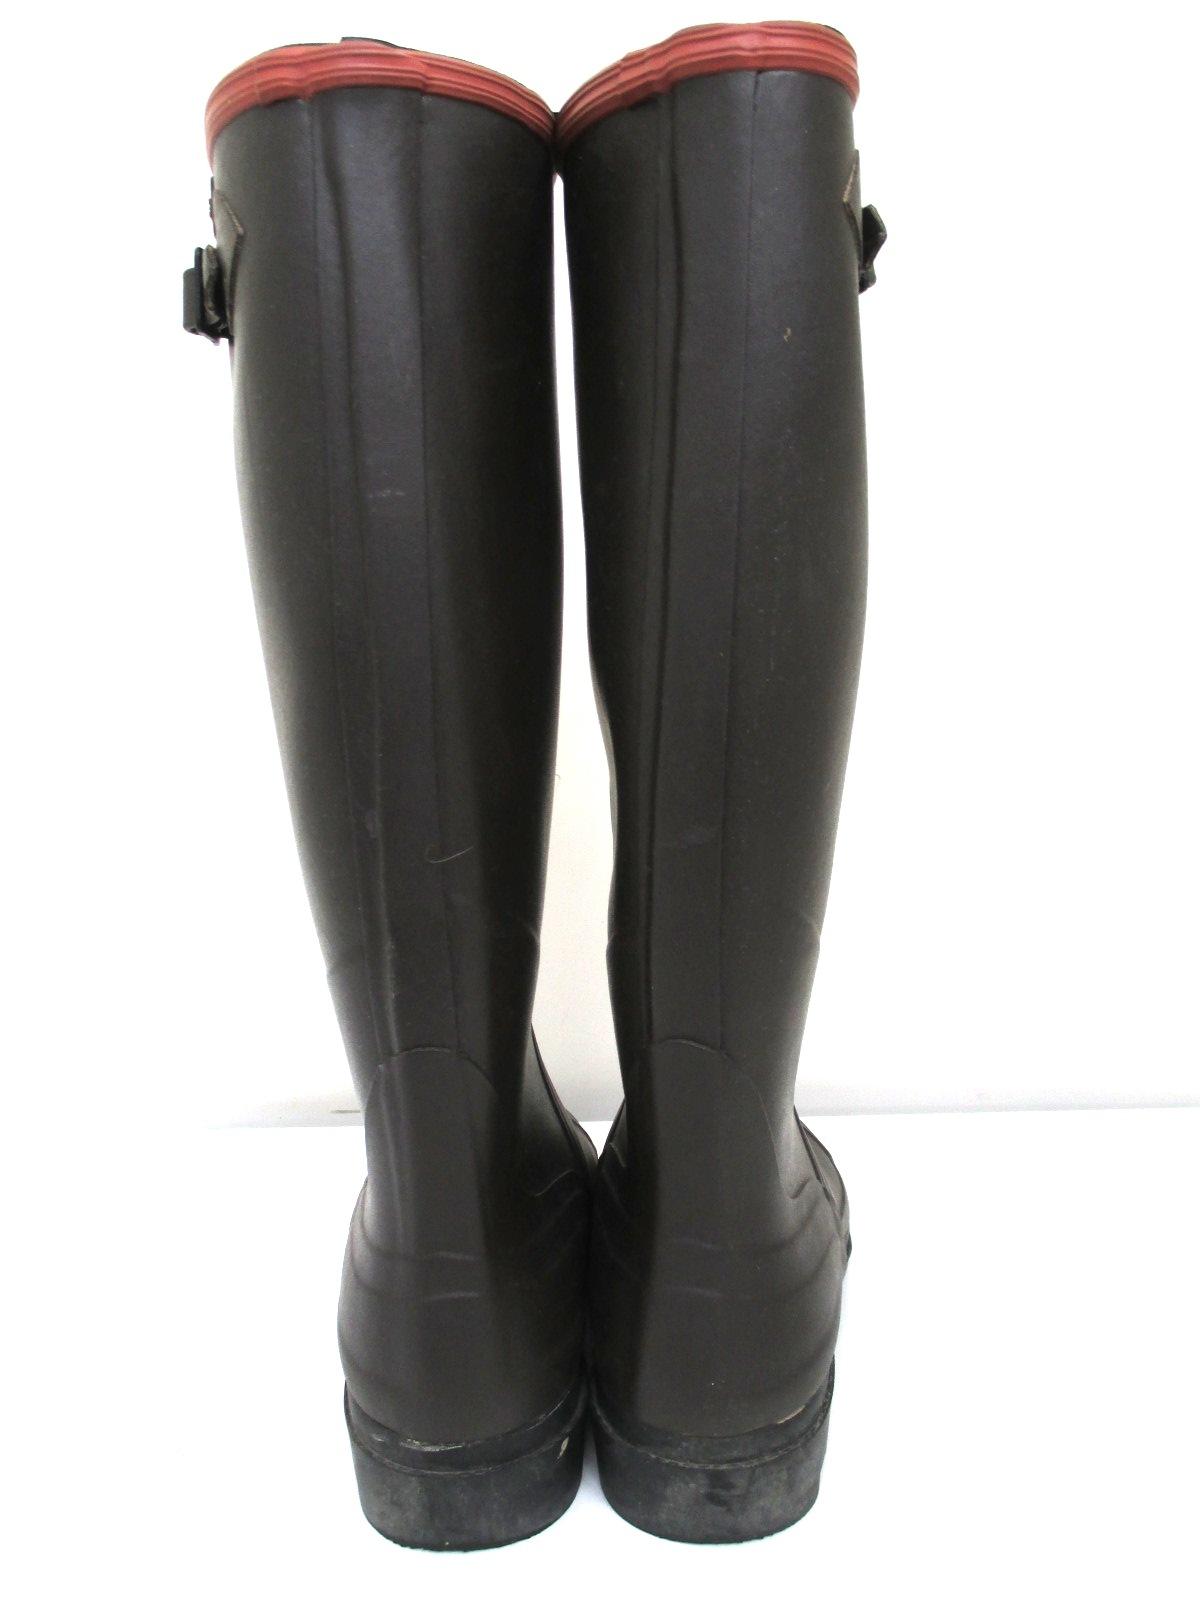 AIGLE(エーグル)のブーツ